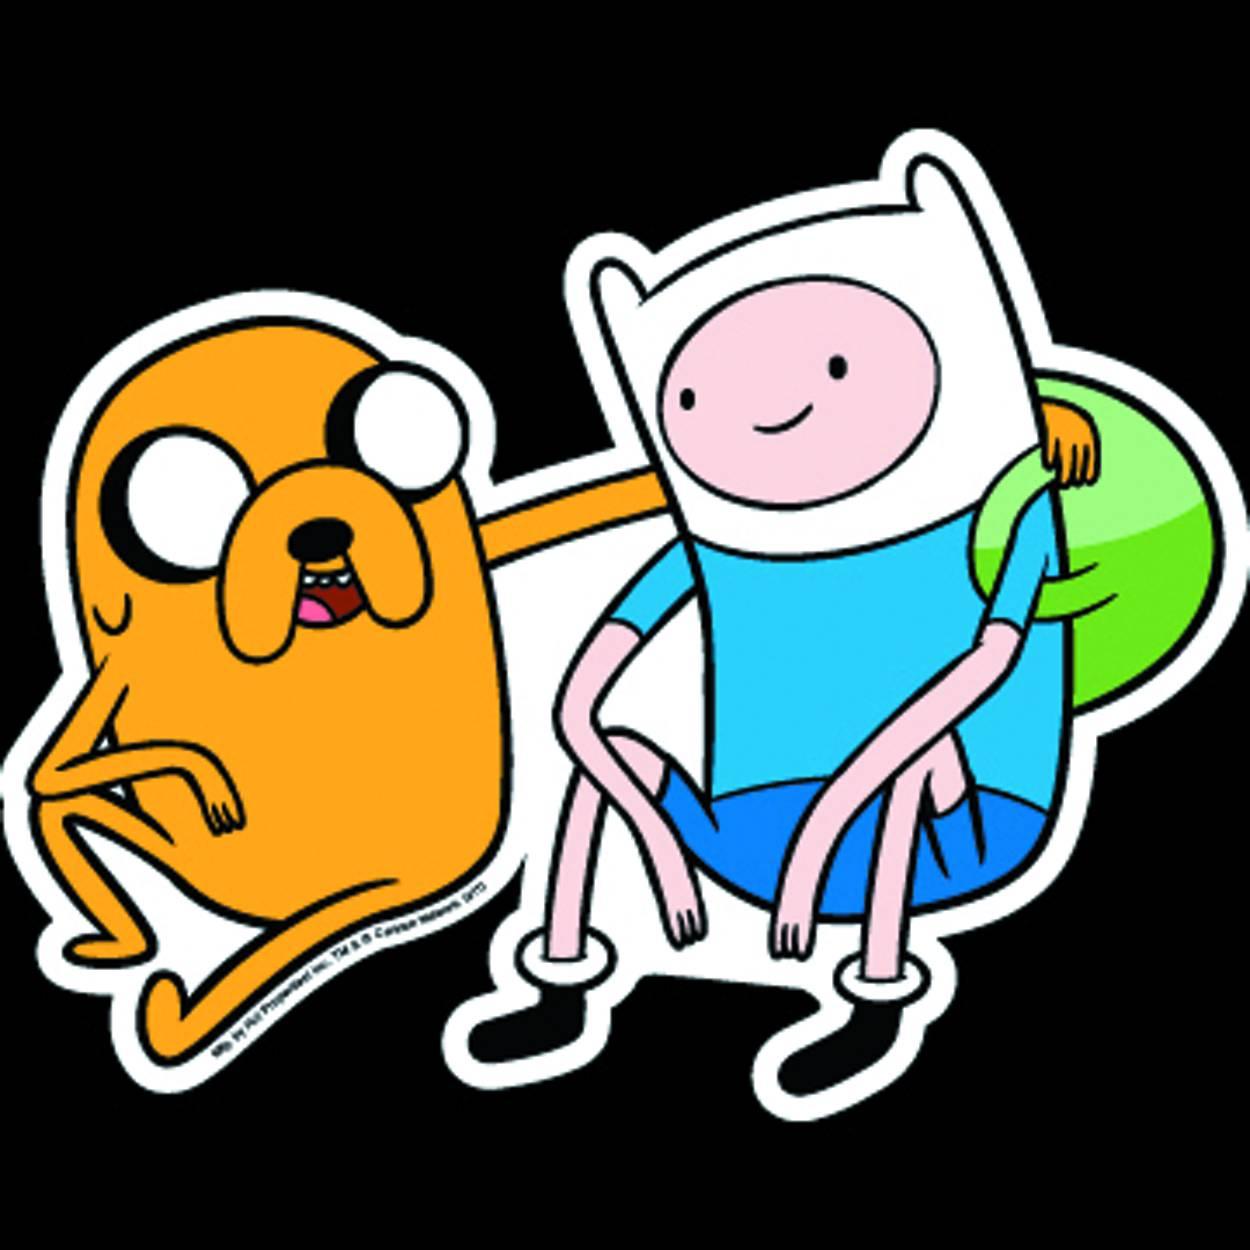 Cartoon Network clipart adventure time Cartoon #adventuretime #tv #friends #shows